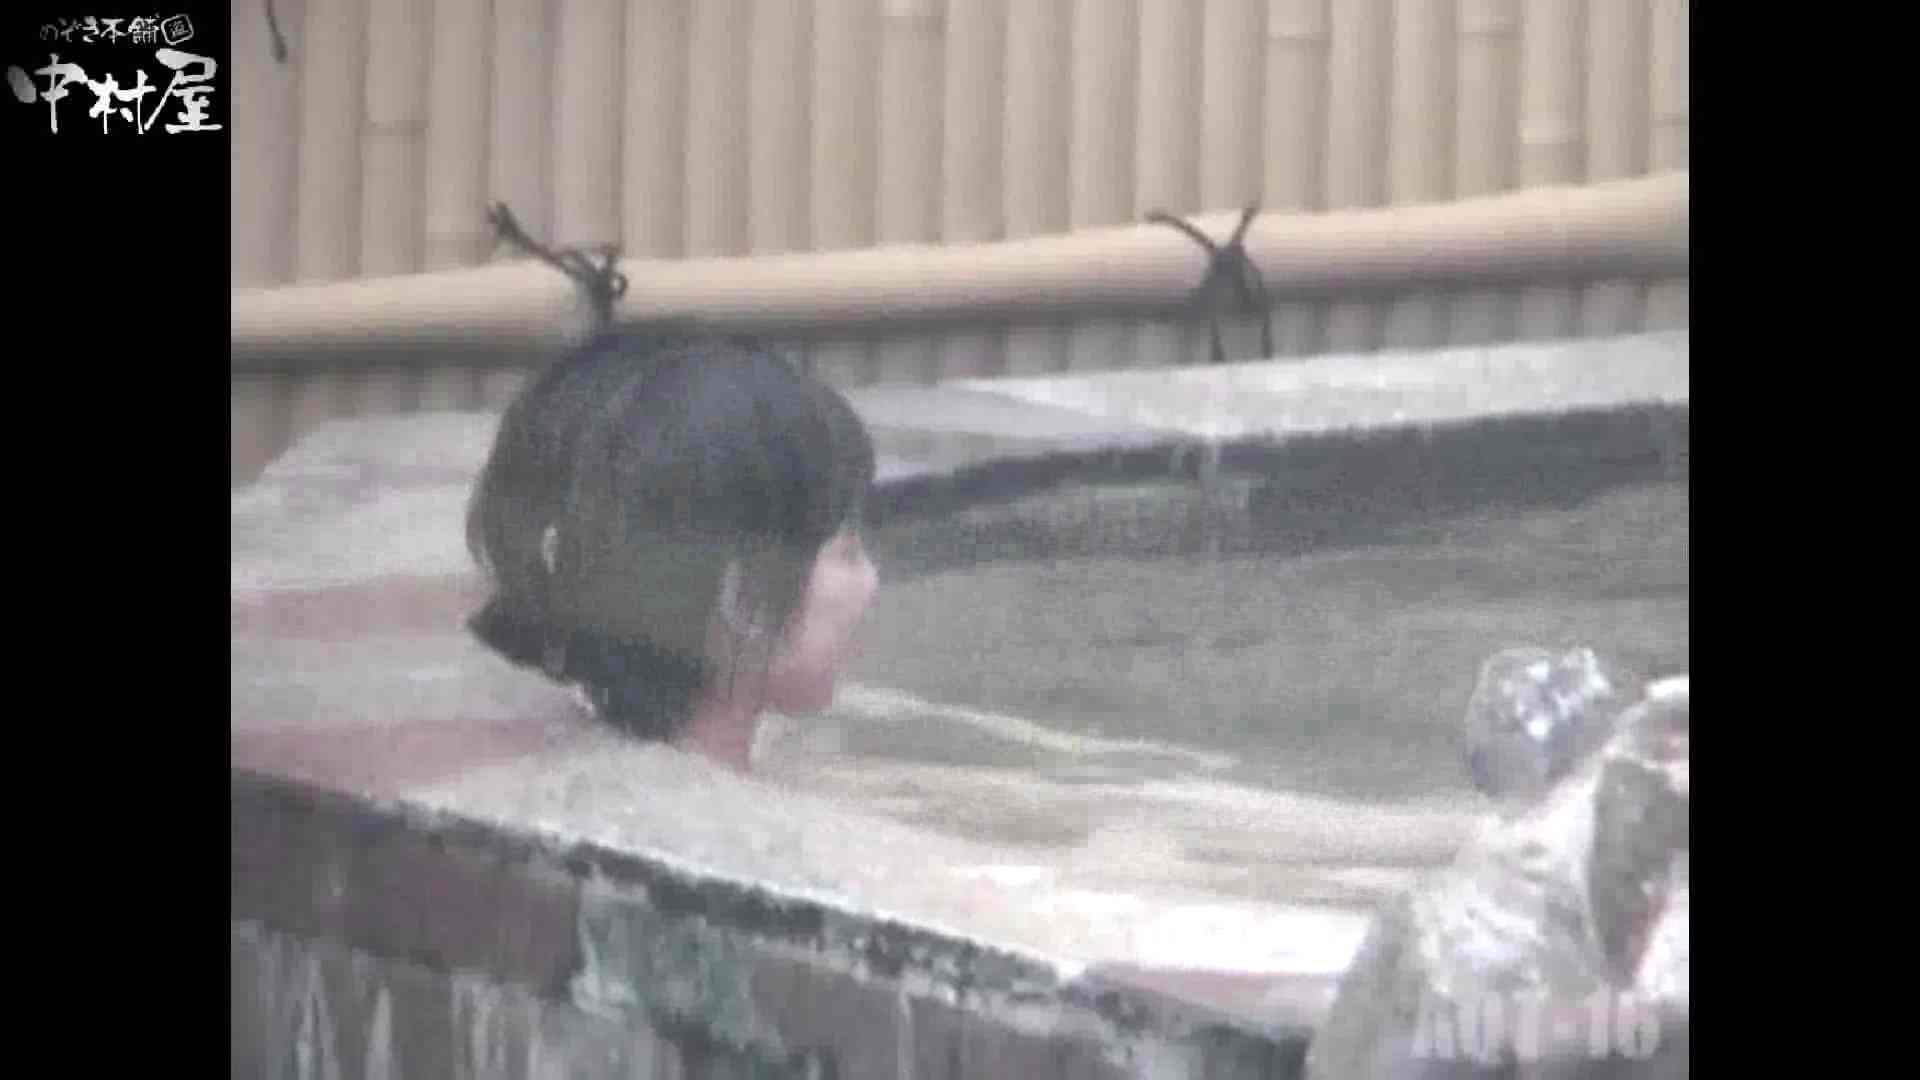 Aquaな露天風呂Vol.880潜入盗撮露天風呂十六判湯 其の七 OLハメ撮り  61Pix 21